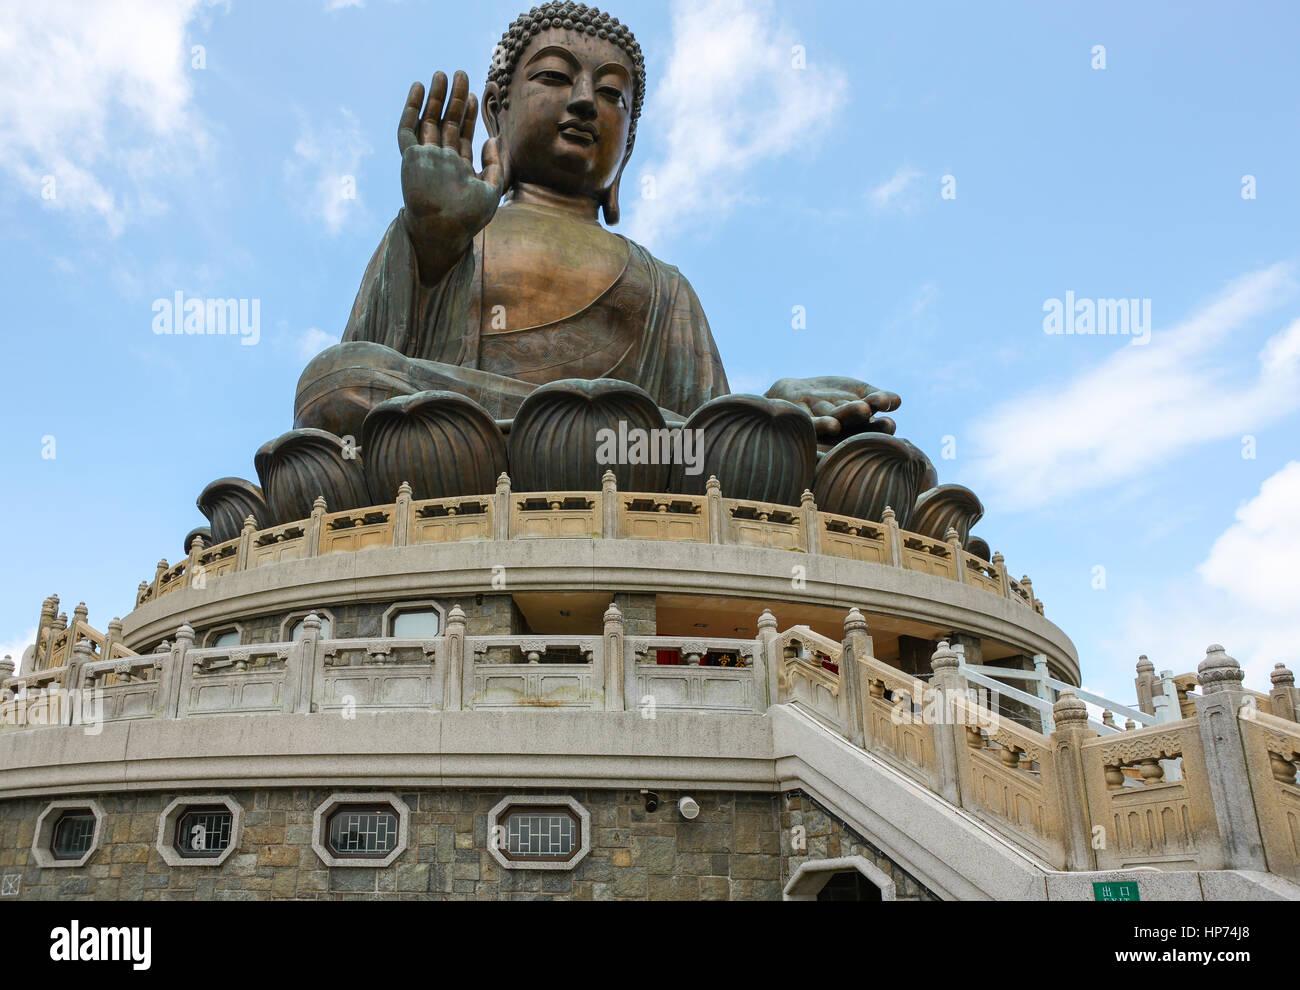 Giant Bronze Tian Tan Buddha on a hillside on Lantau Island - Stock Image